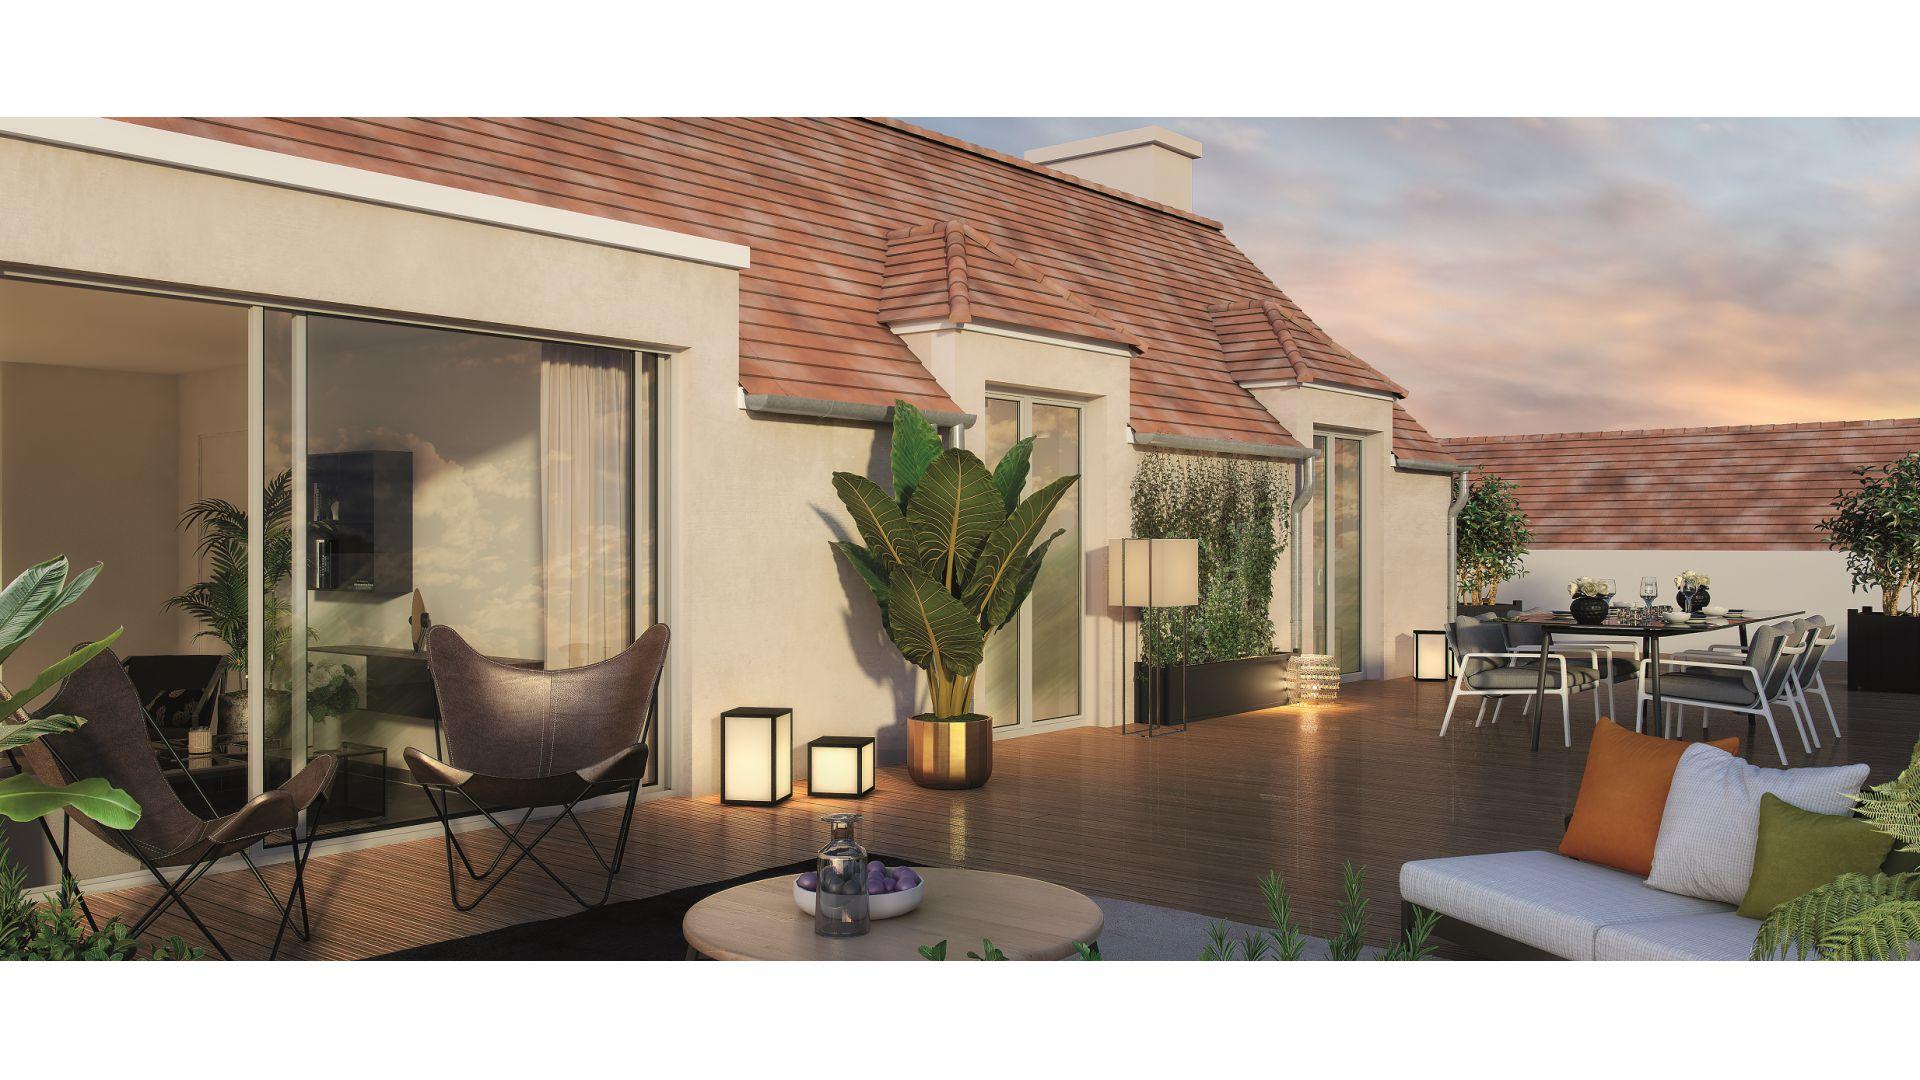 GreenCity Immobilier - Esprit Lodge - Périgny sur yerres - 94520 vue terrasse